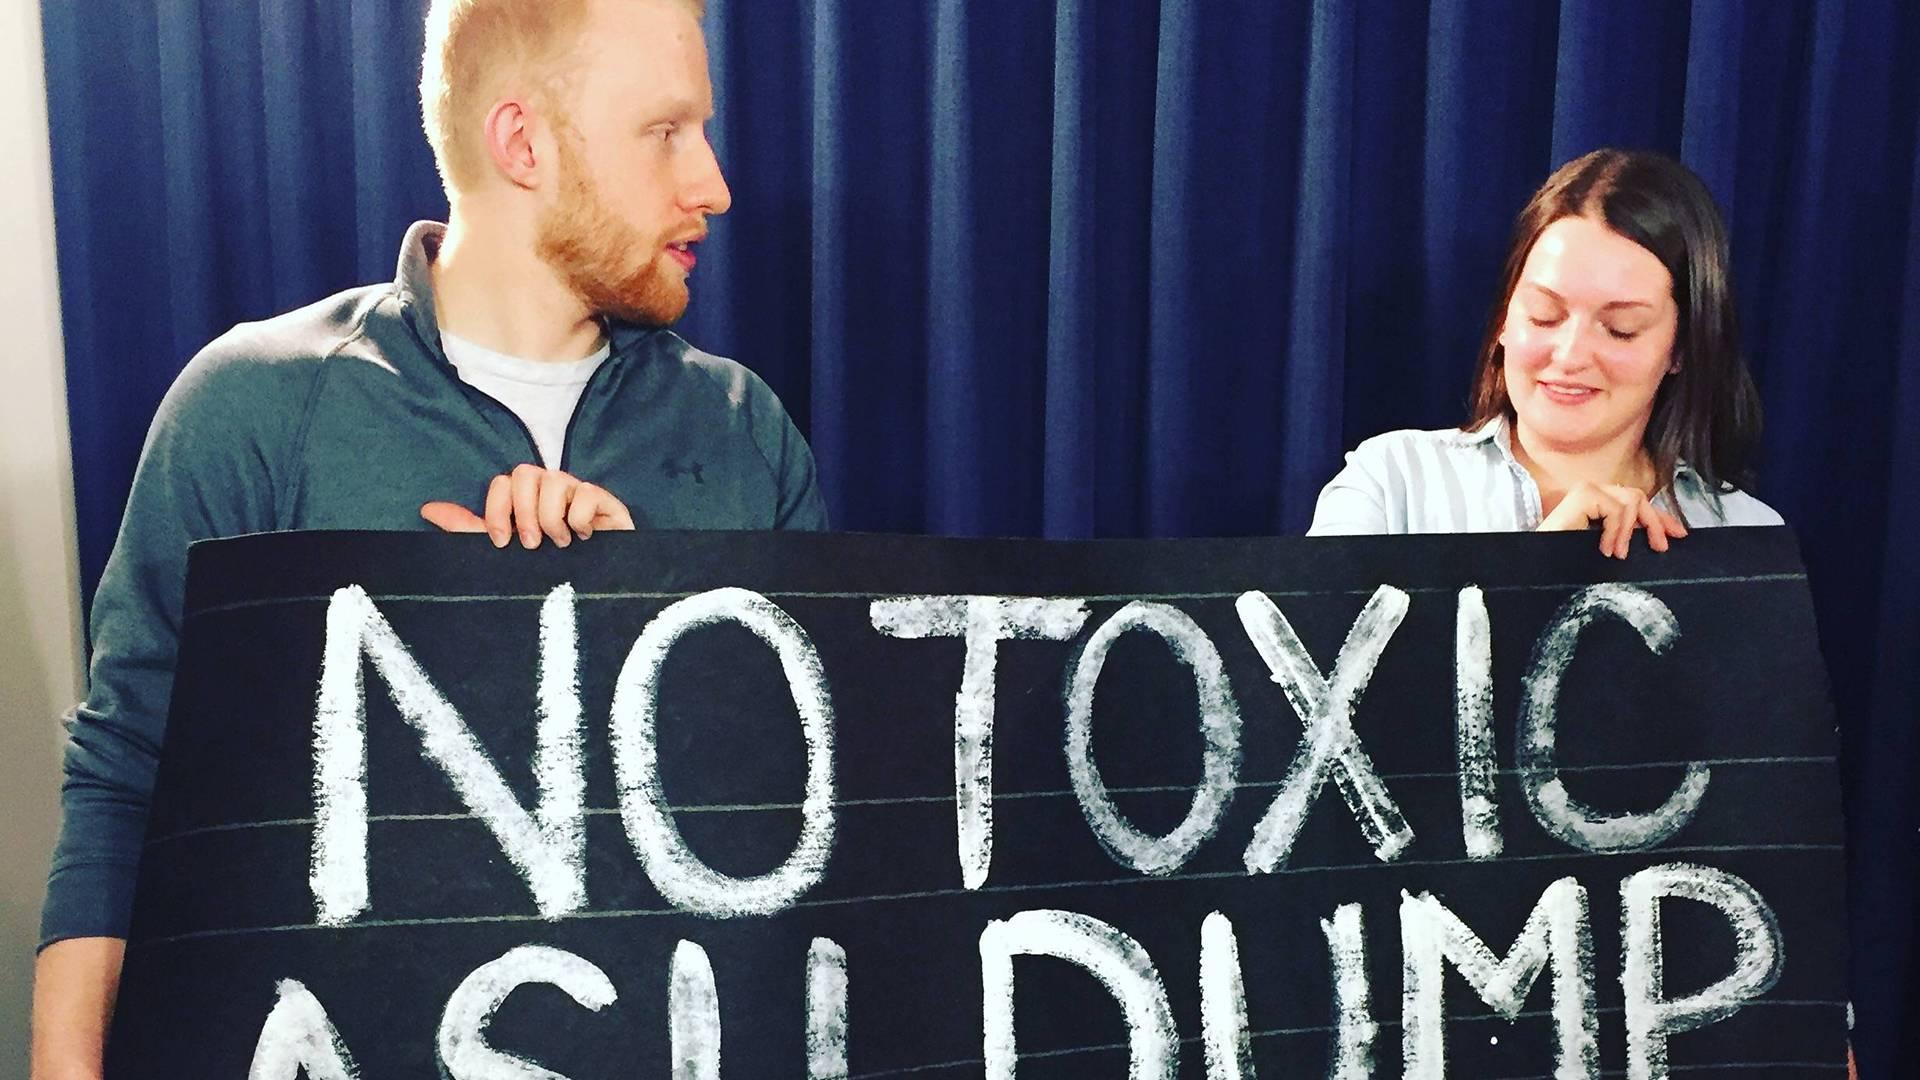 Environmental groups say 'no' to incinerator ash dump